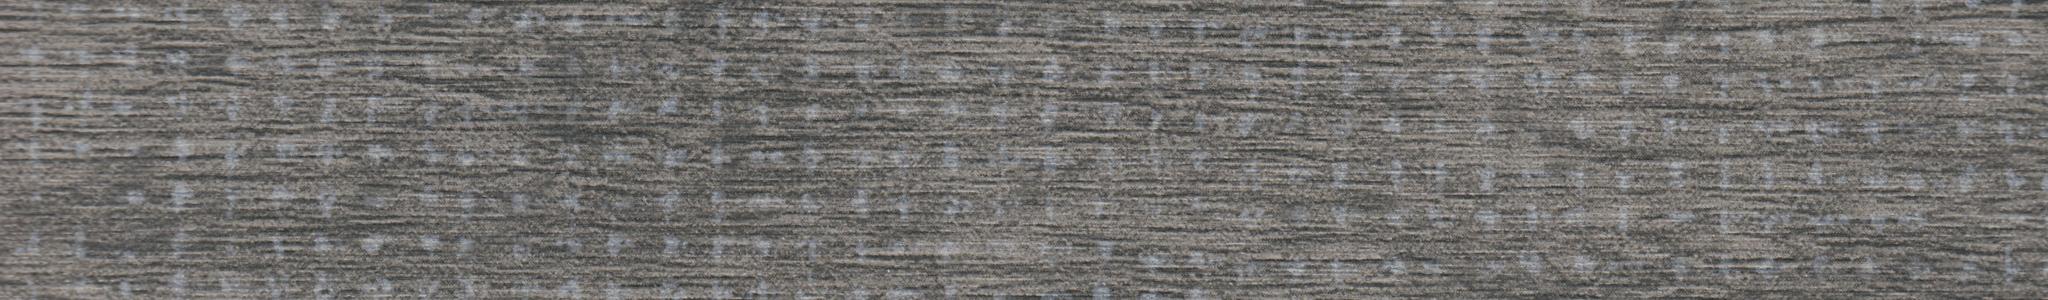 HD 29313 ABS hrana Steelcut šedý titan gravír